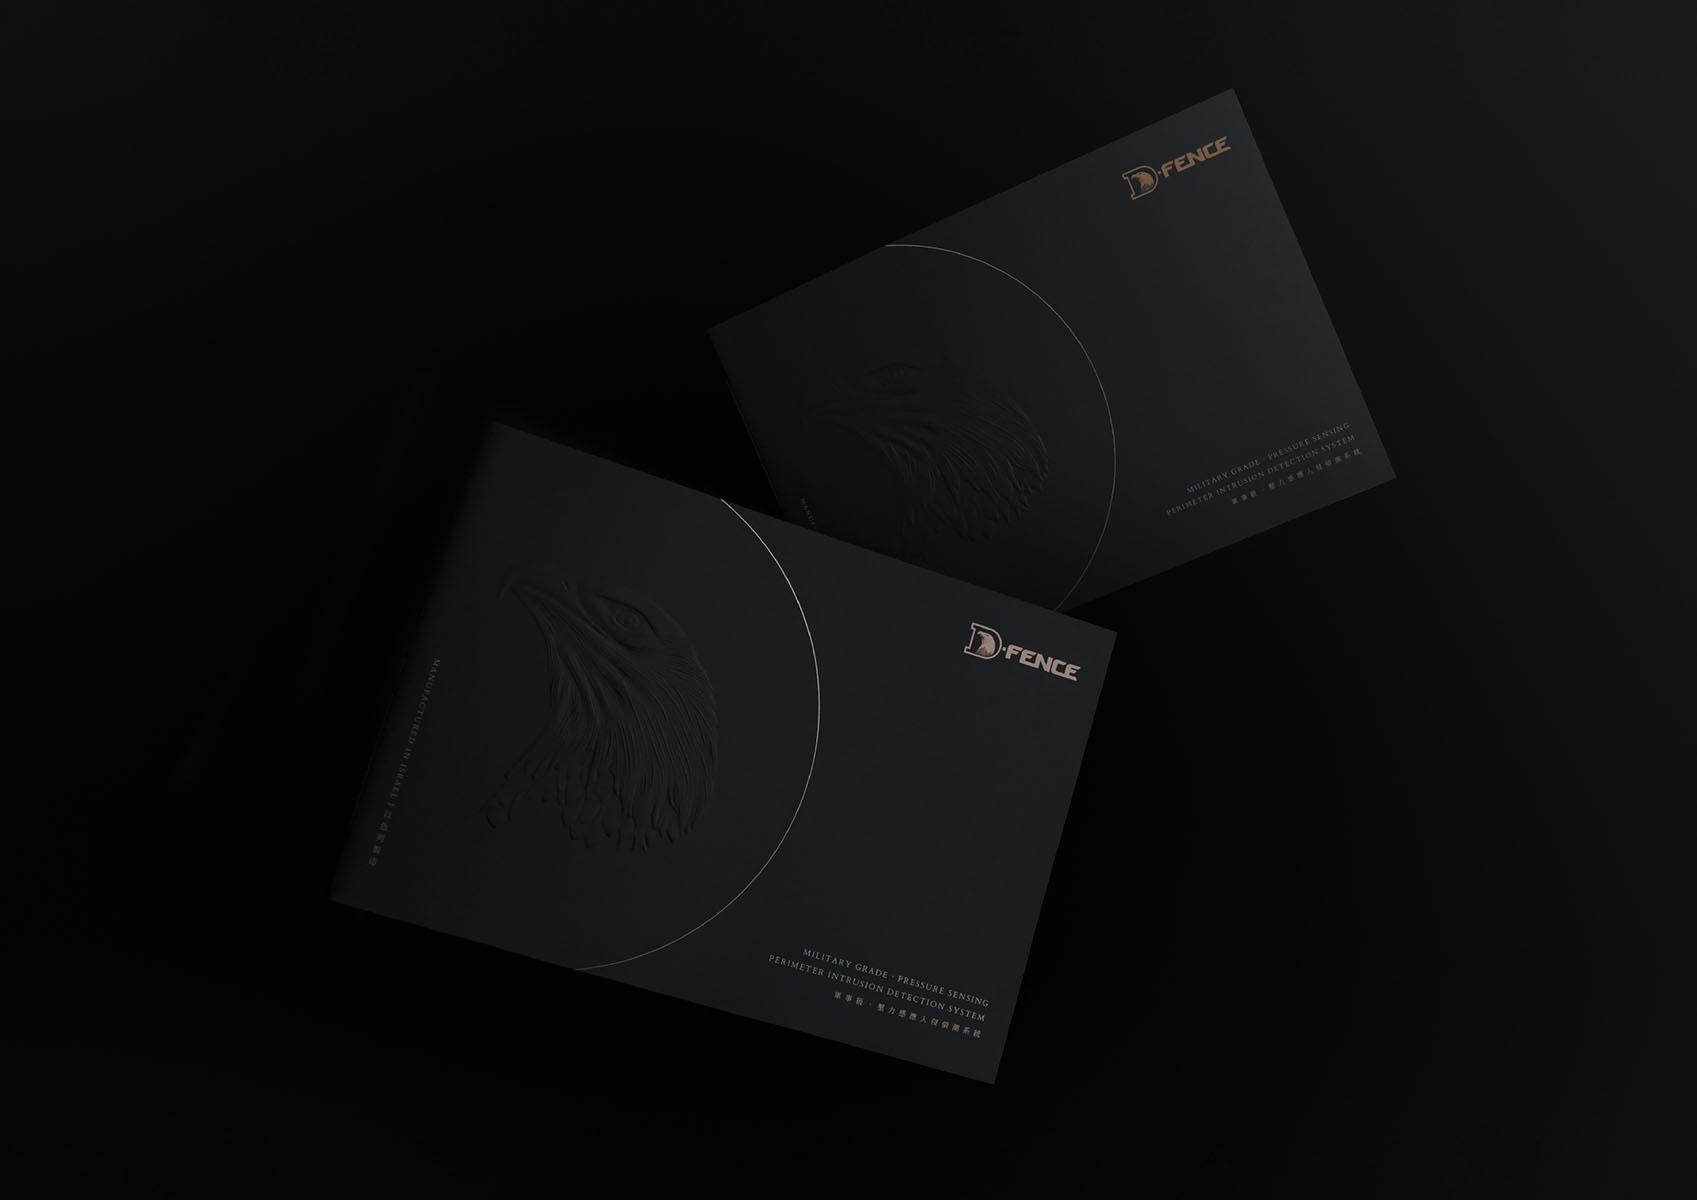 D-FENCE Perimeter Intrusion Detection System brochure